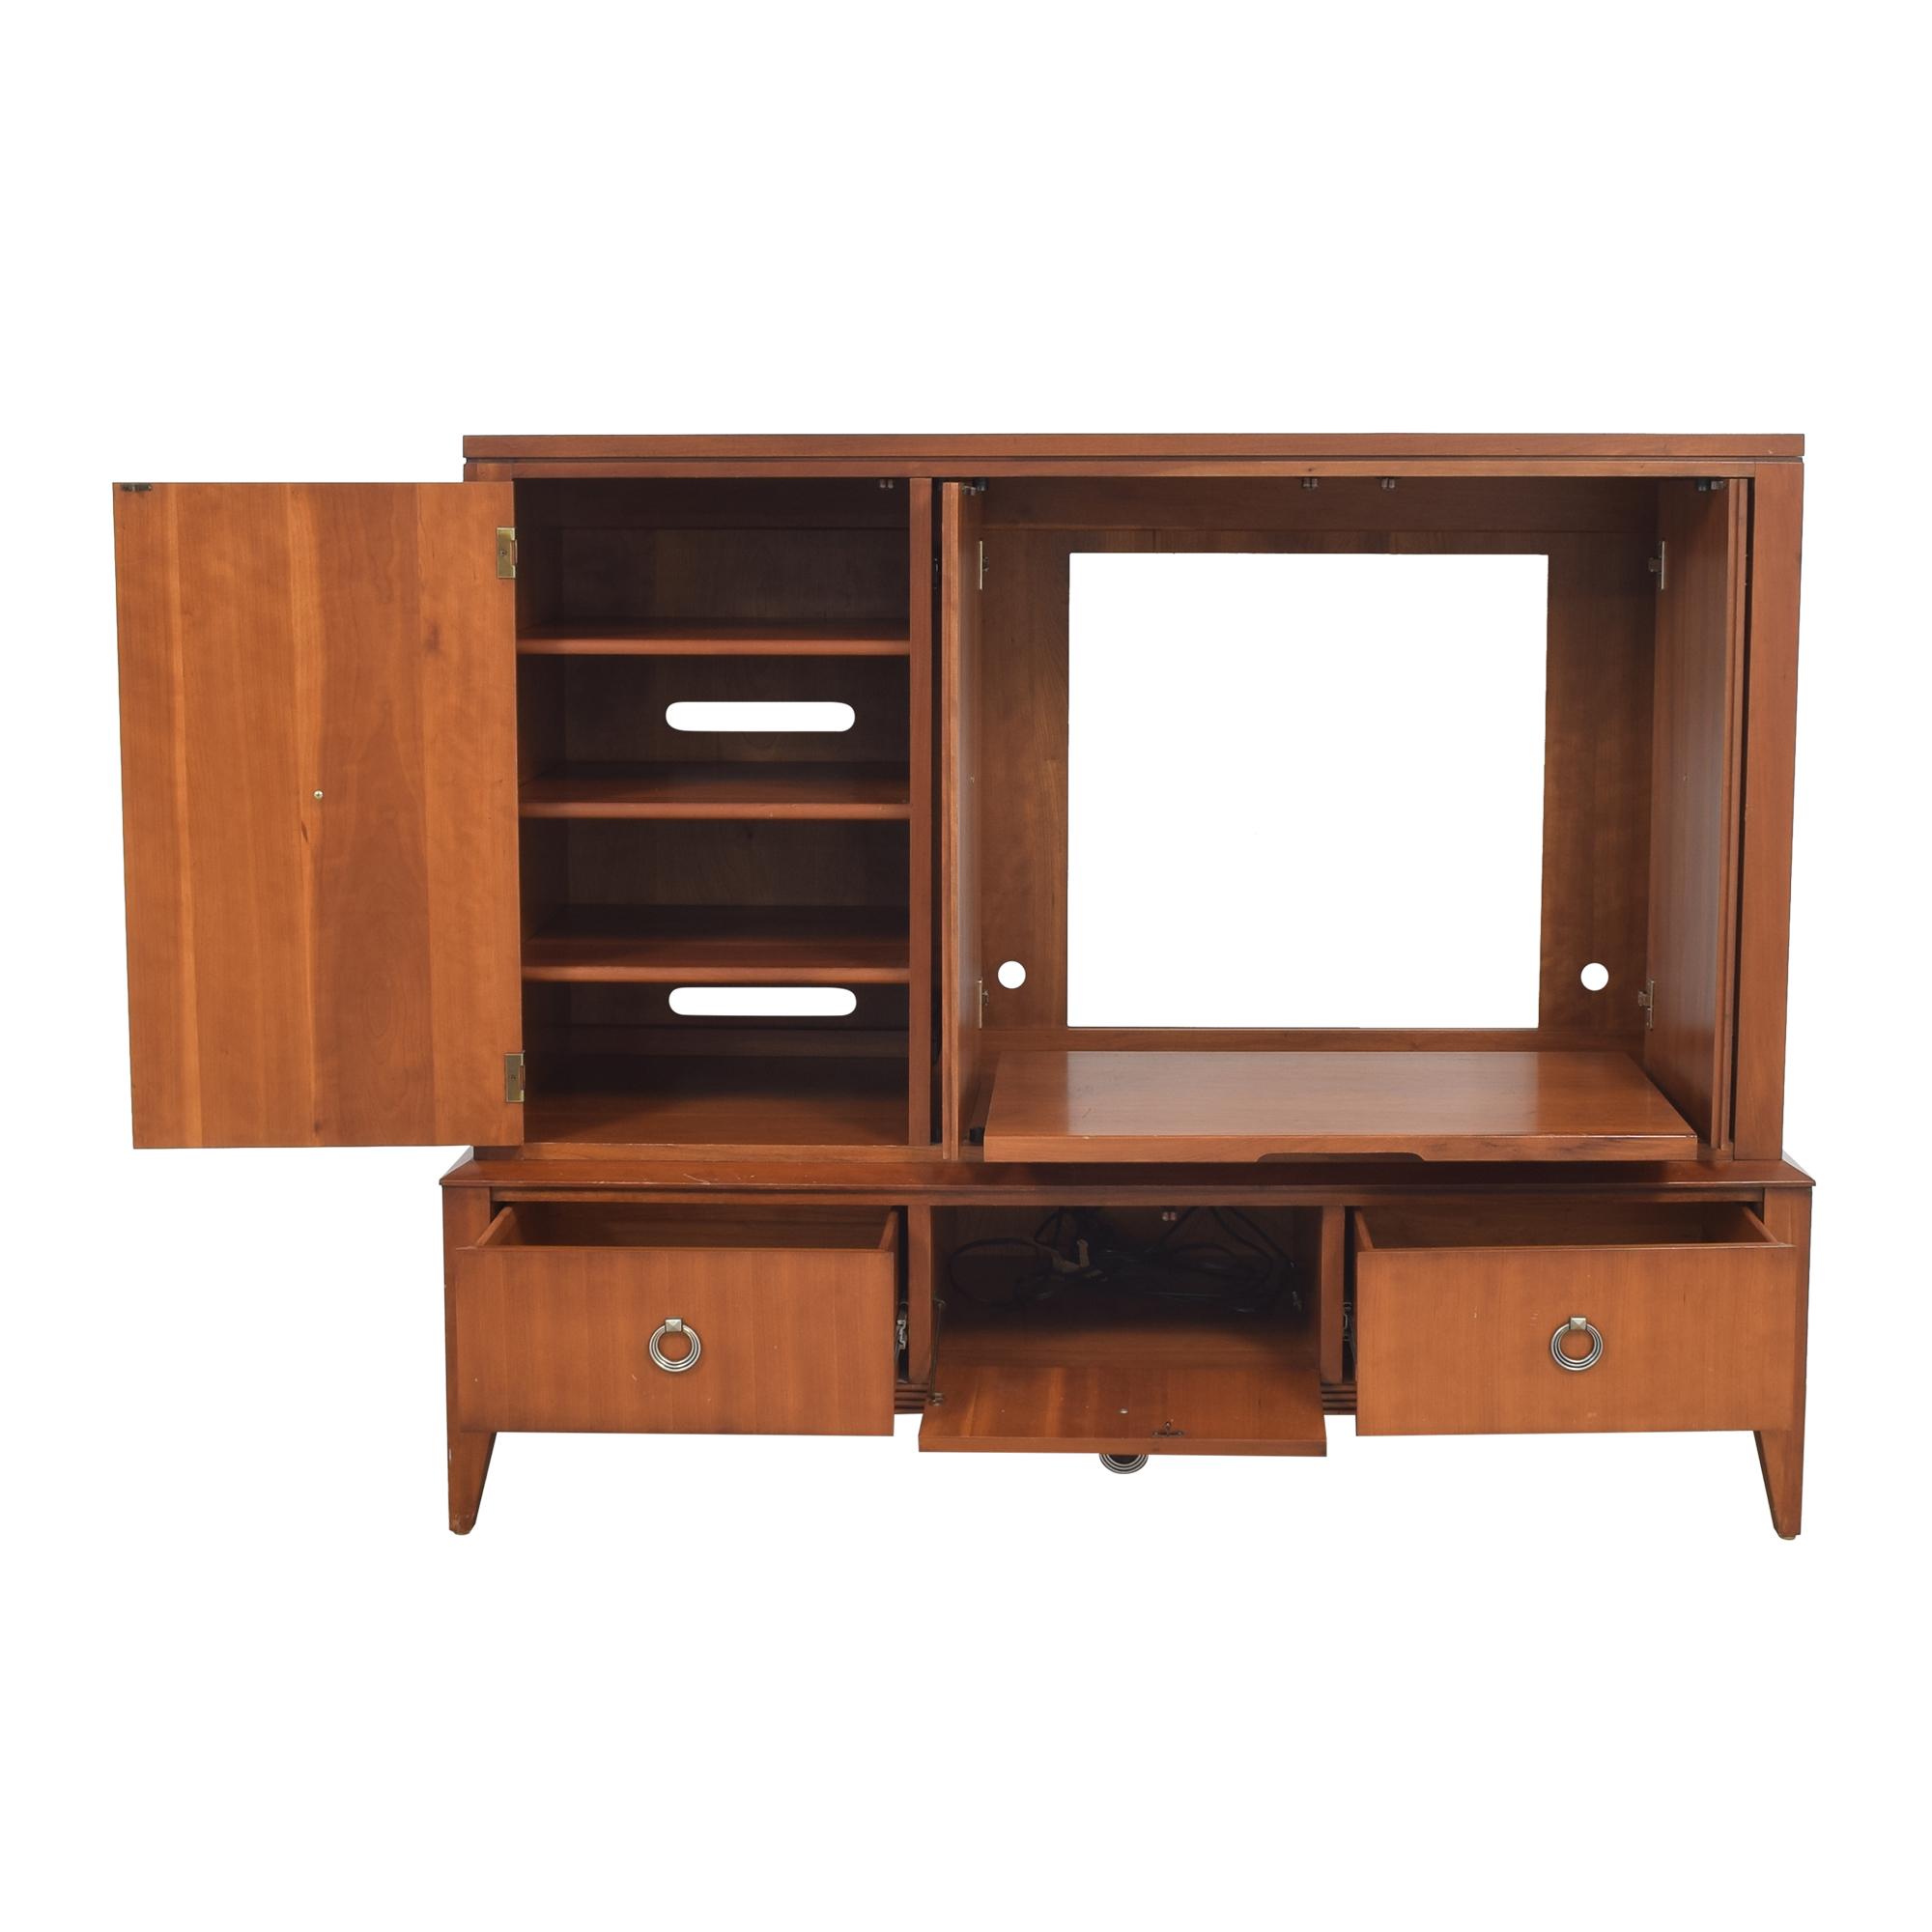 Ethan Allen Ethan Allen Avenue Collection Media Cabinet discount